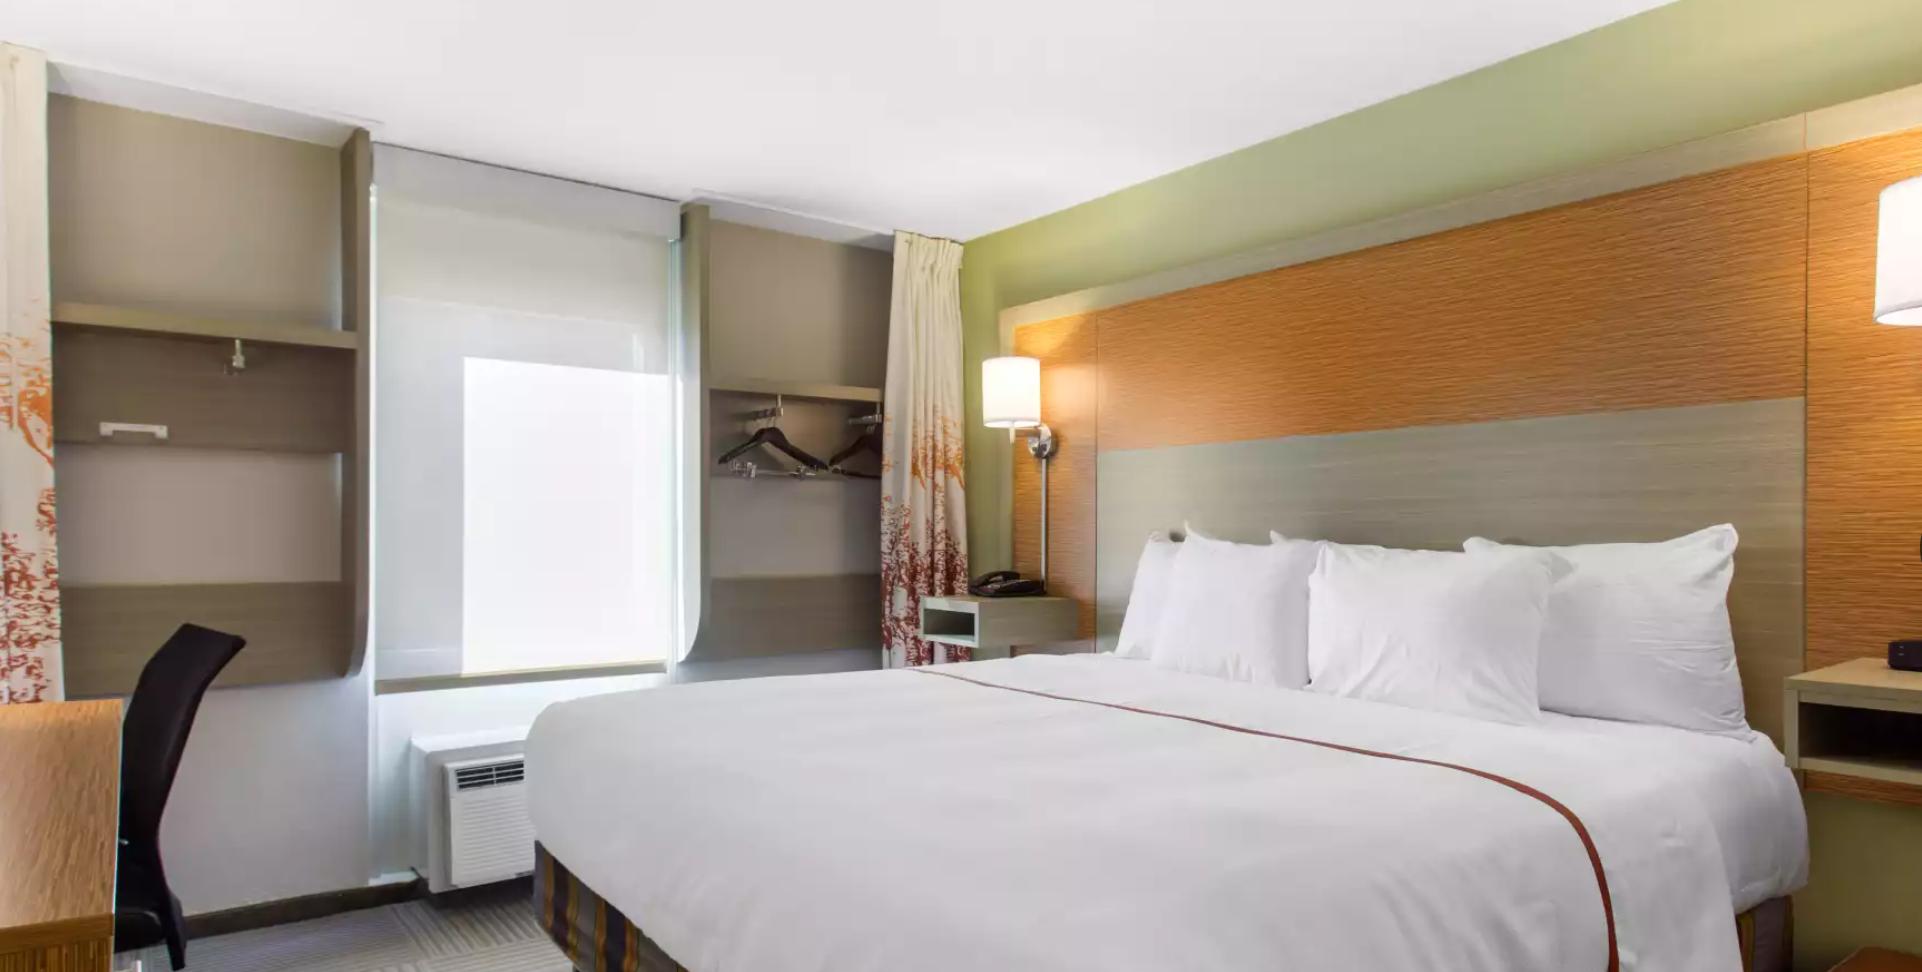 https://www.hotelsbyday.com/_data/default-hotel_image/3/19084/screenshot-2020-06-23-at-2-54-25-pm.png